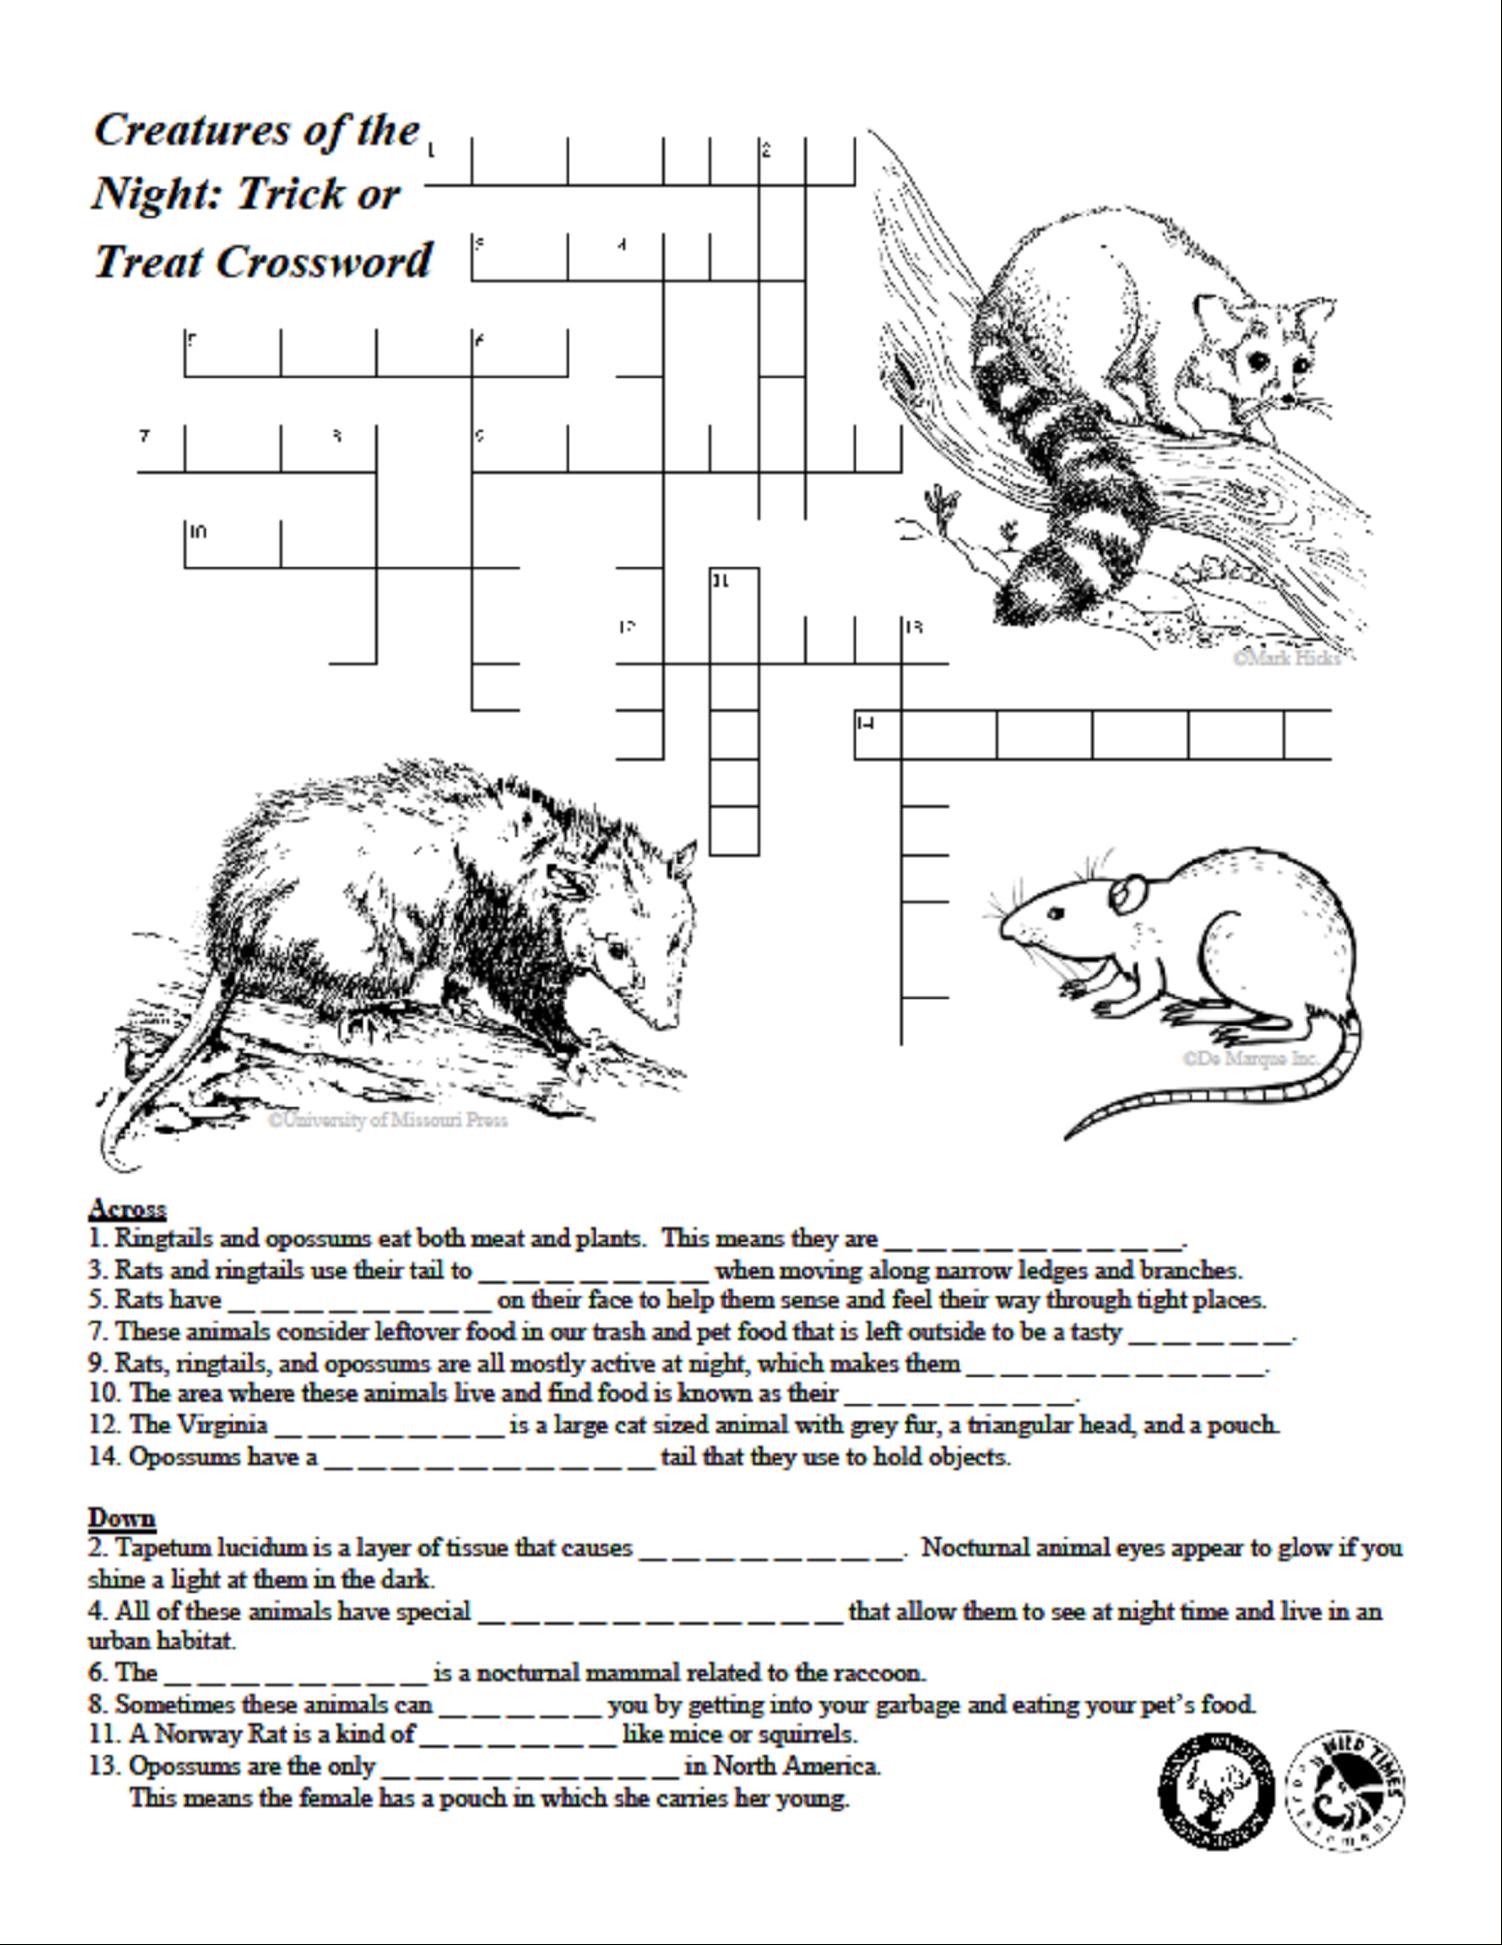 Creatures Of The Night Crossword Puzzle - Texas Wildlife Association - Wildlife Crossword Puzzle Printable